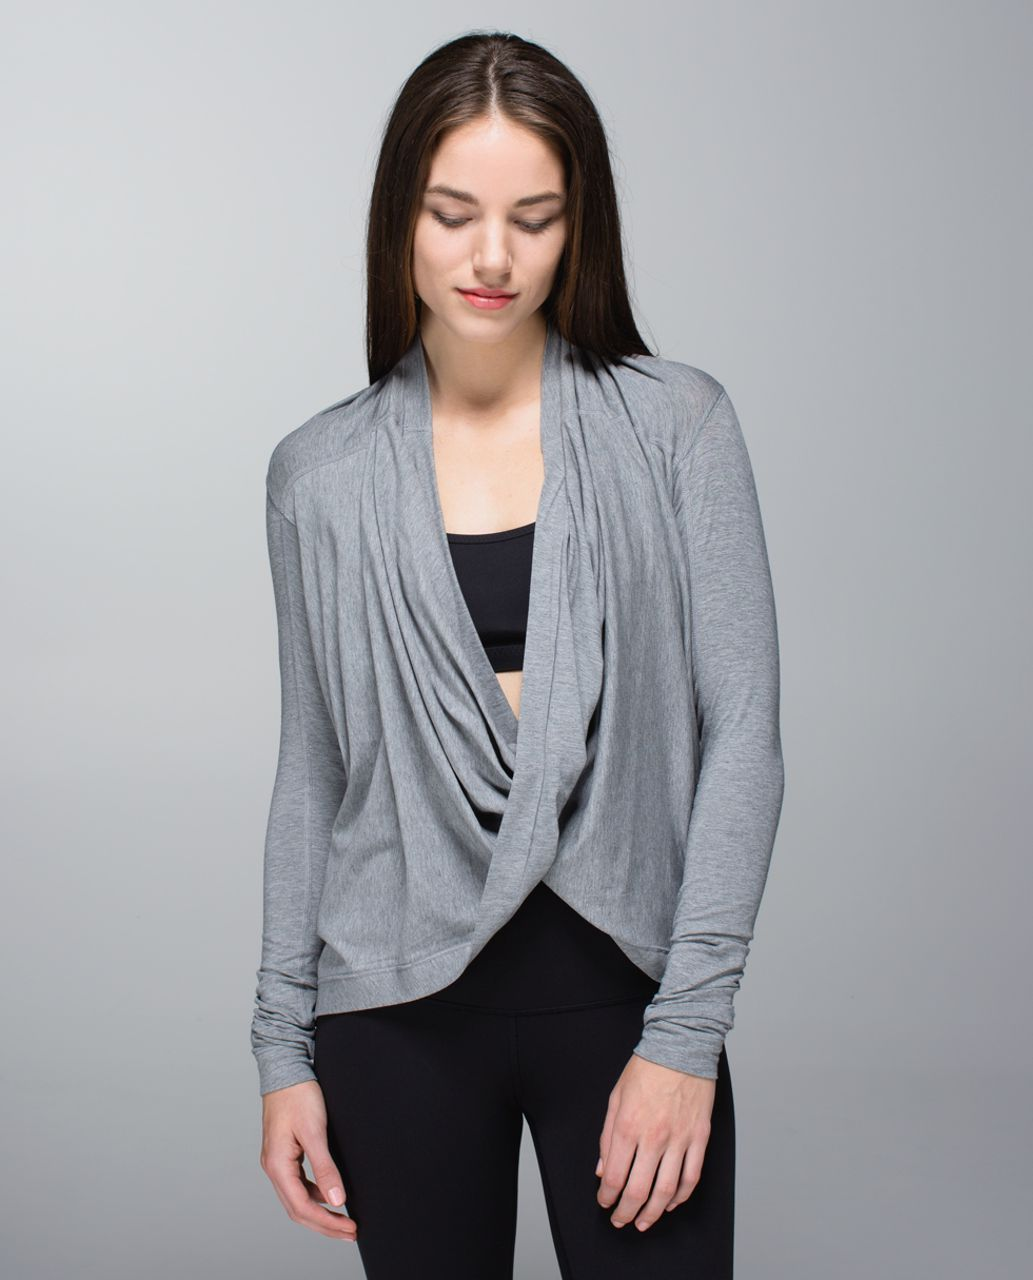 e75e3cb8ca Lululemon Iconic Wrap - Heathered Medium Grey - lulu fanatics